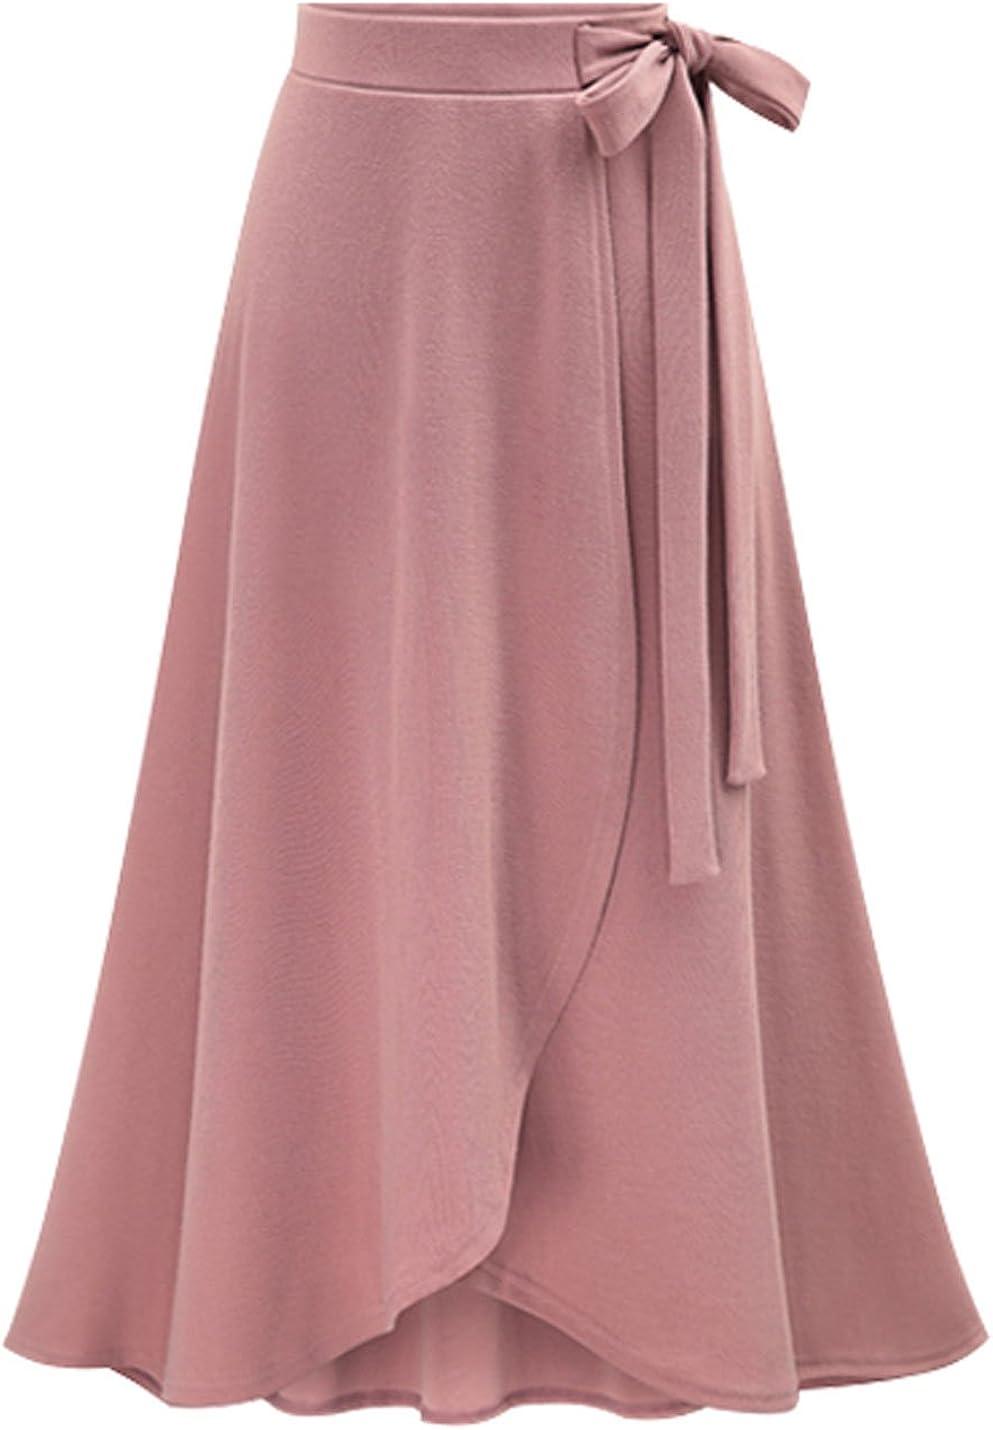 Yeokou Women's Casual Solid High Low Irregular Hem Maxi Midi Long Knit Skirt